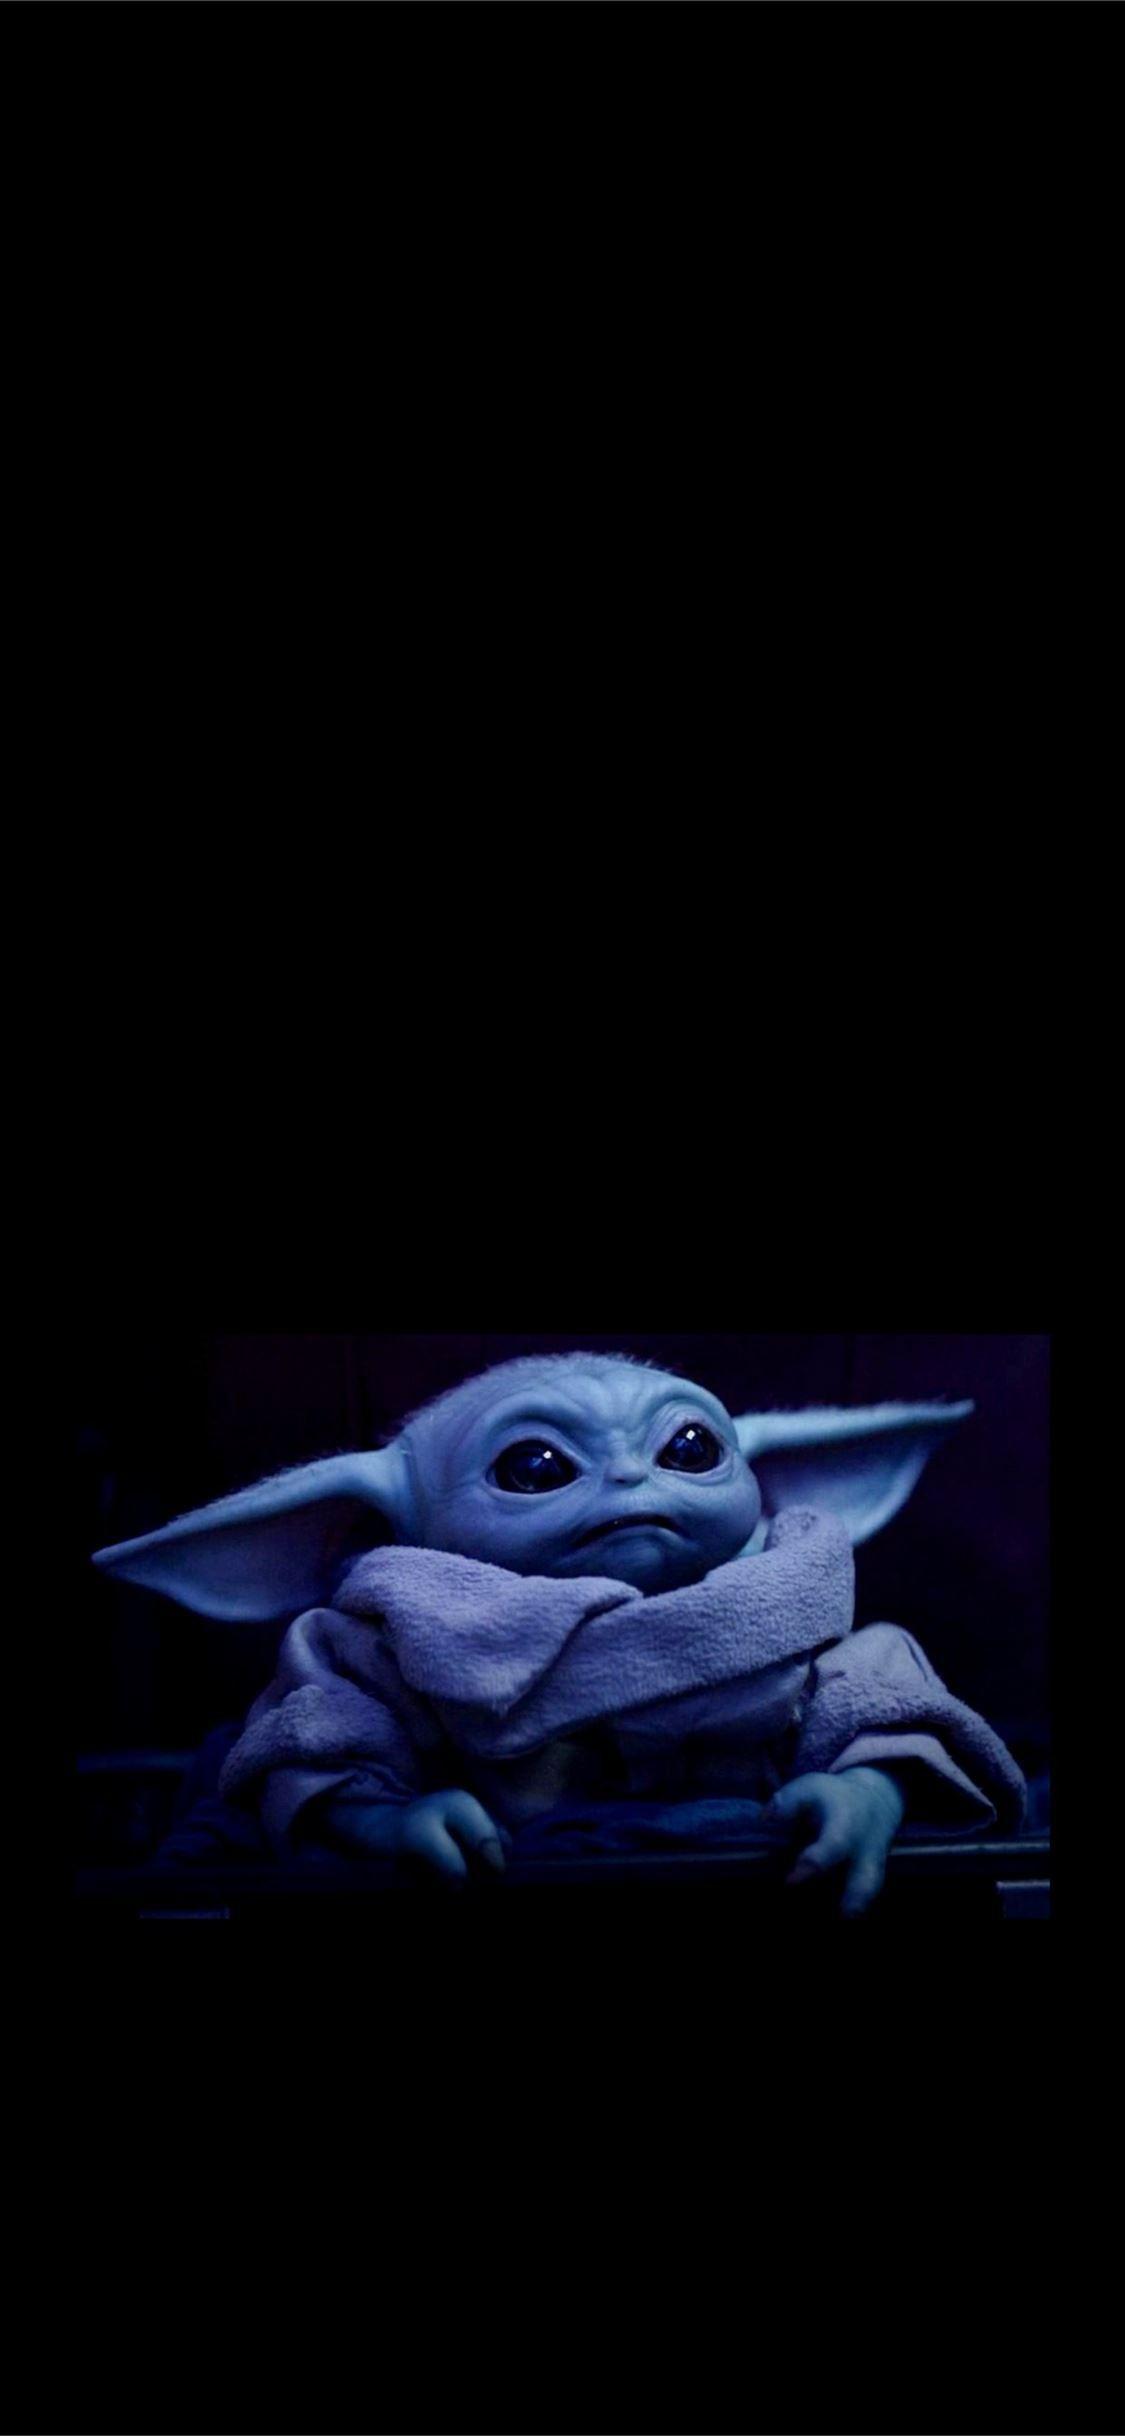 Baby Yoda Again Imgur Babyyoda Trends Iphone11wallpaper In 2021 Yoda Wallpaper Yoda Pictures Star Wars Wallpaper